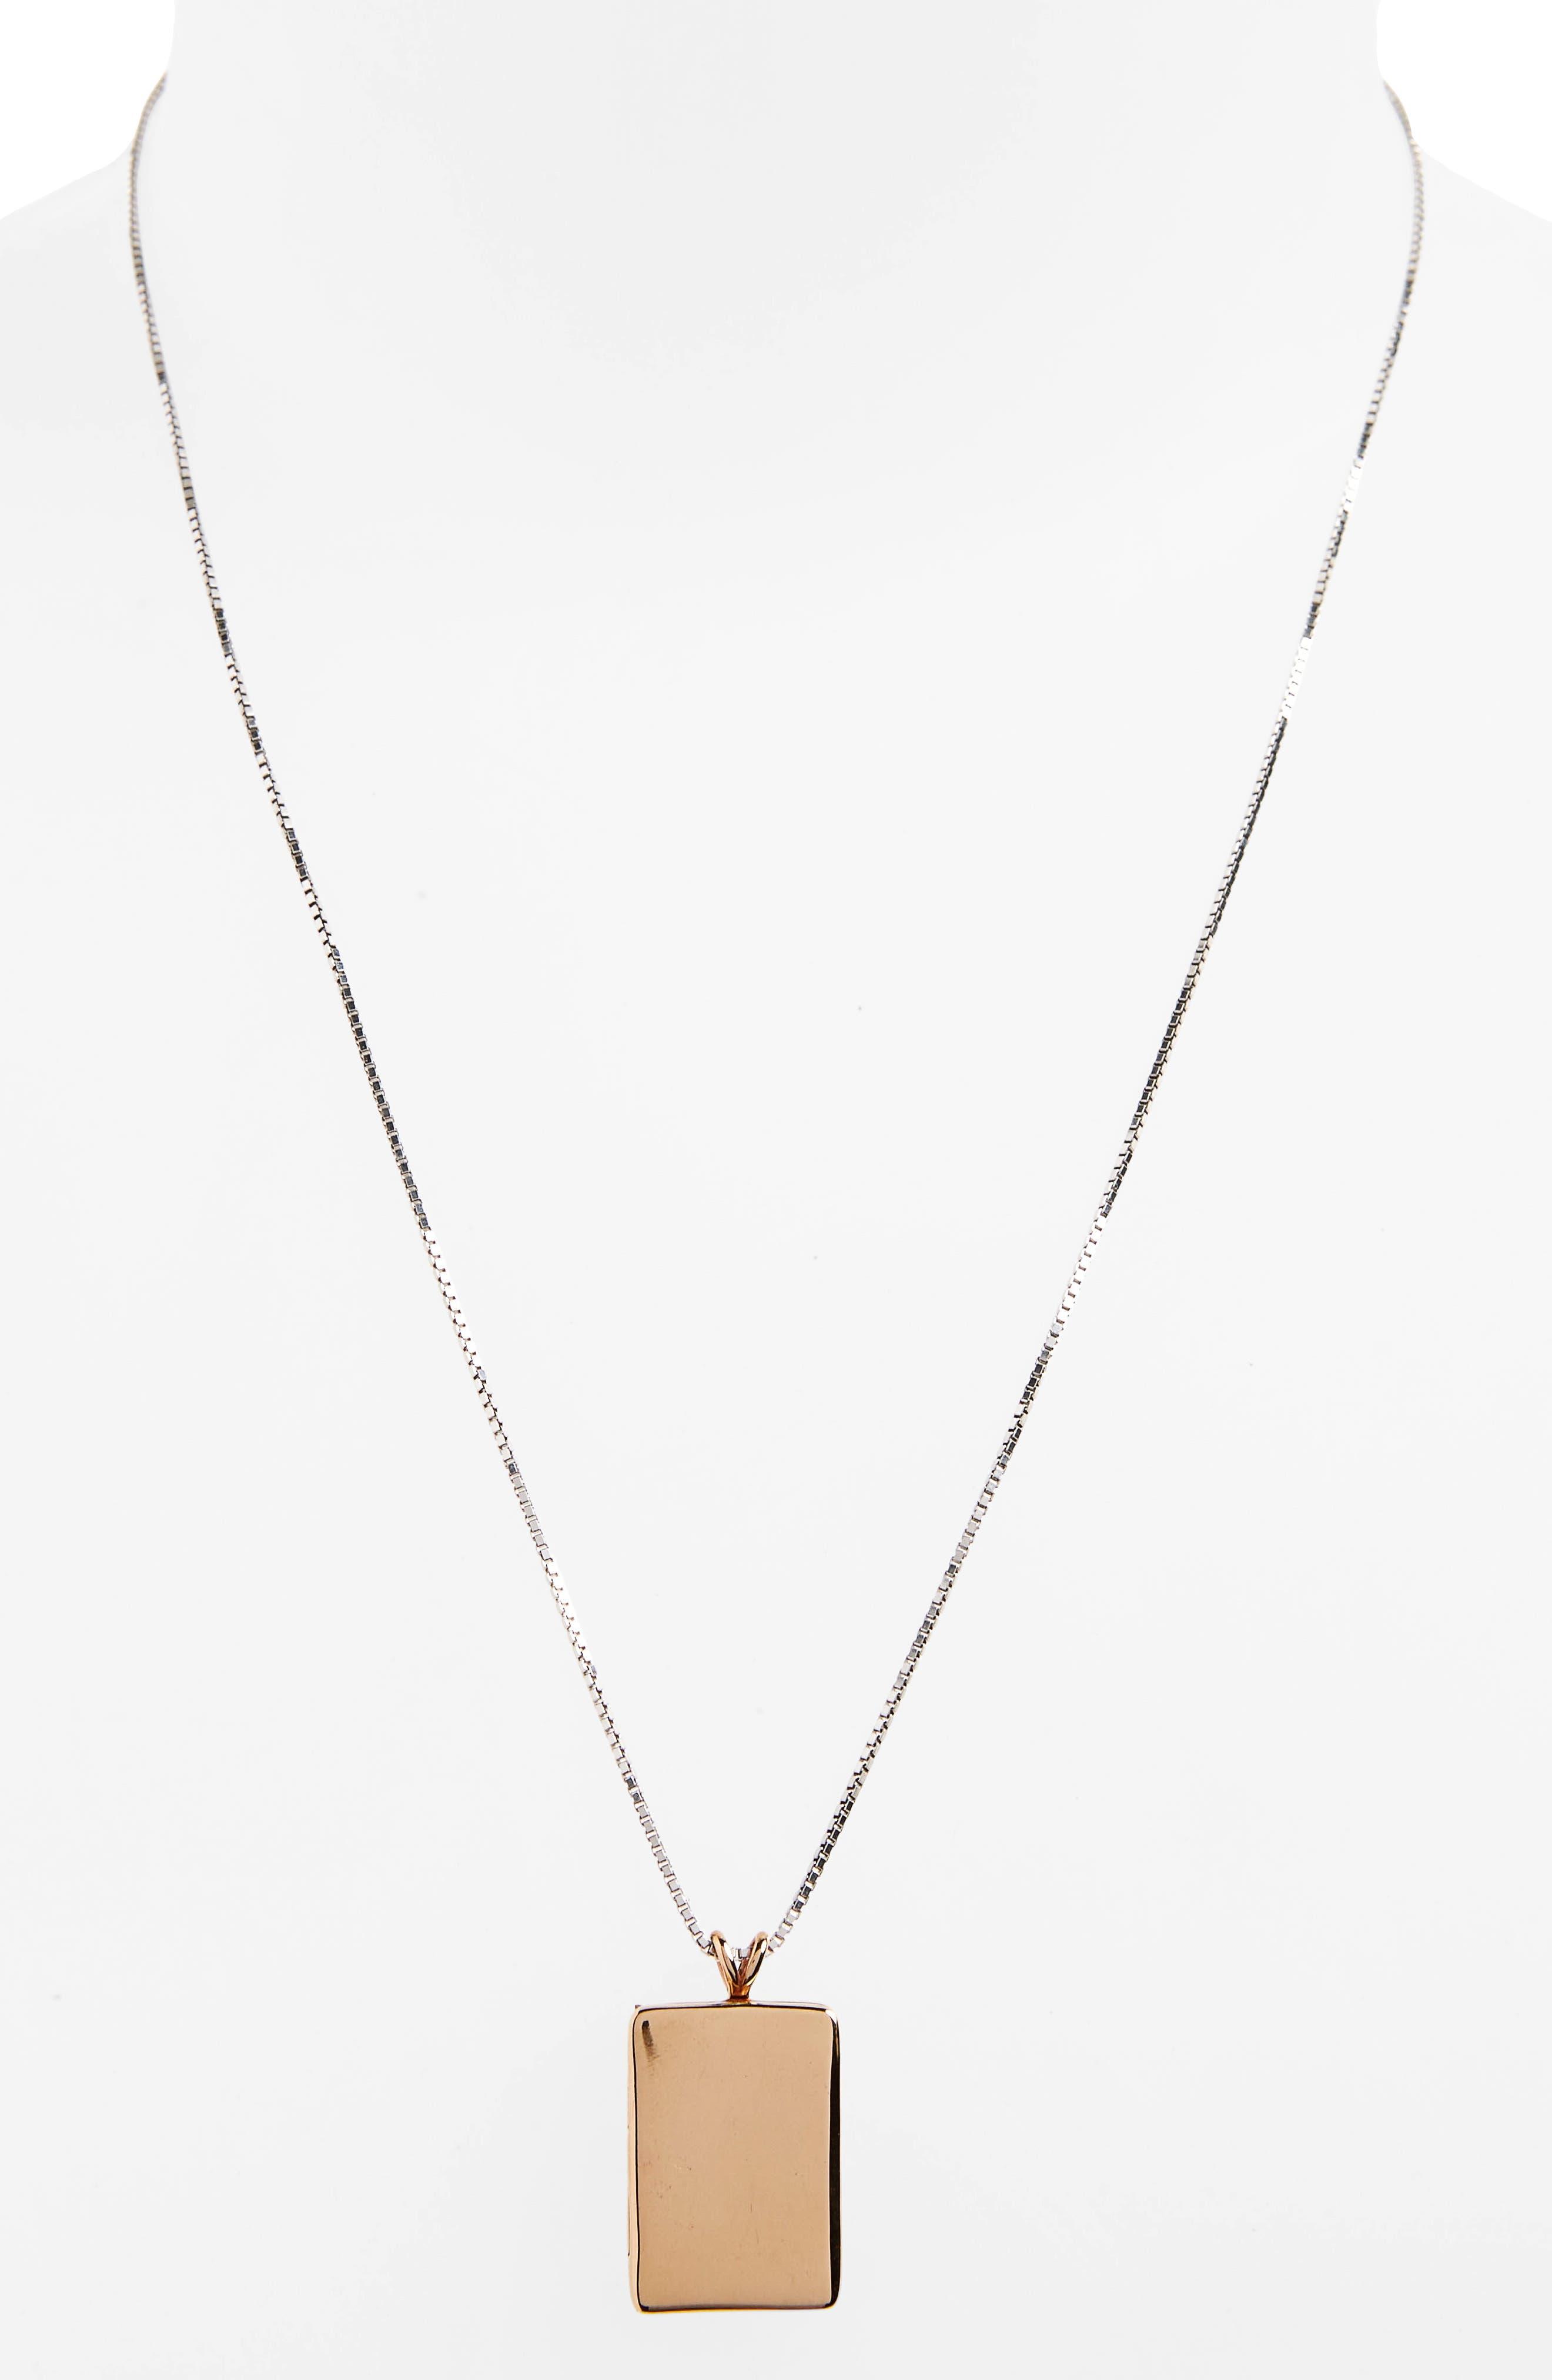 Madewell Bronze Locket Necklace